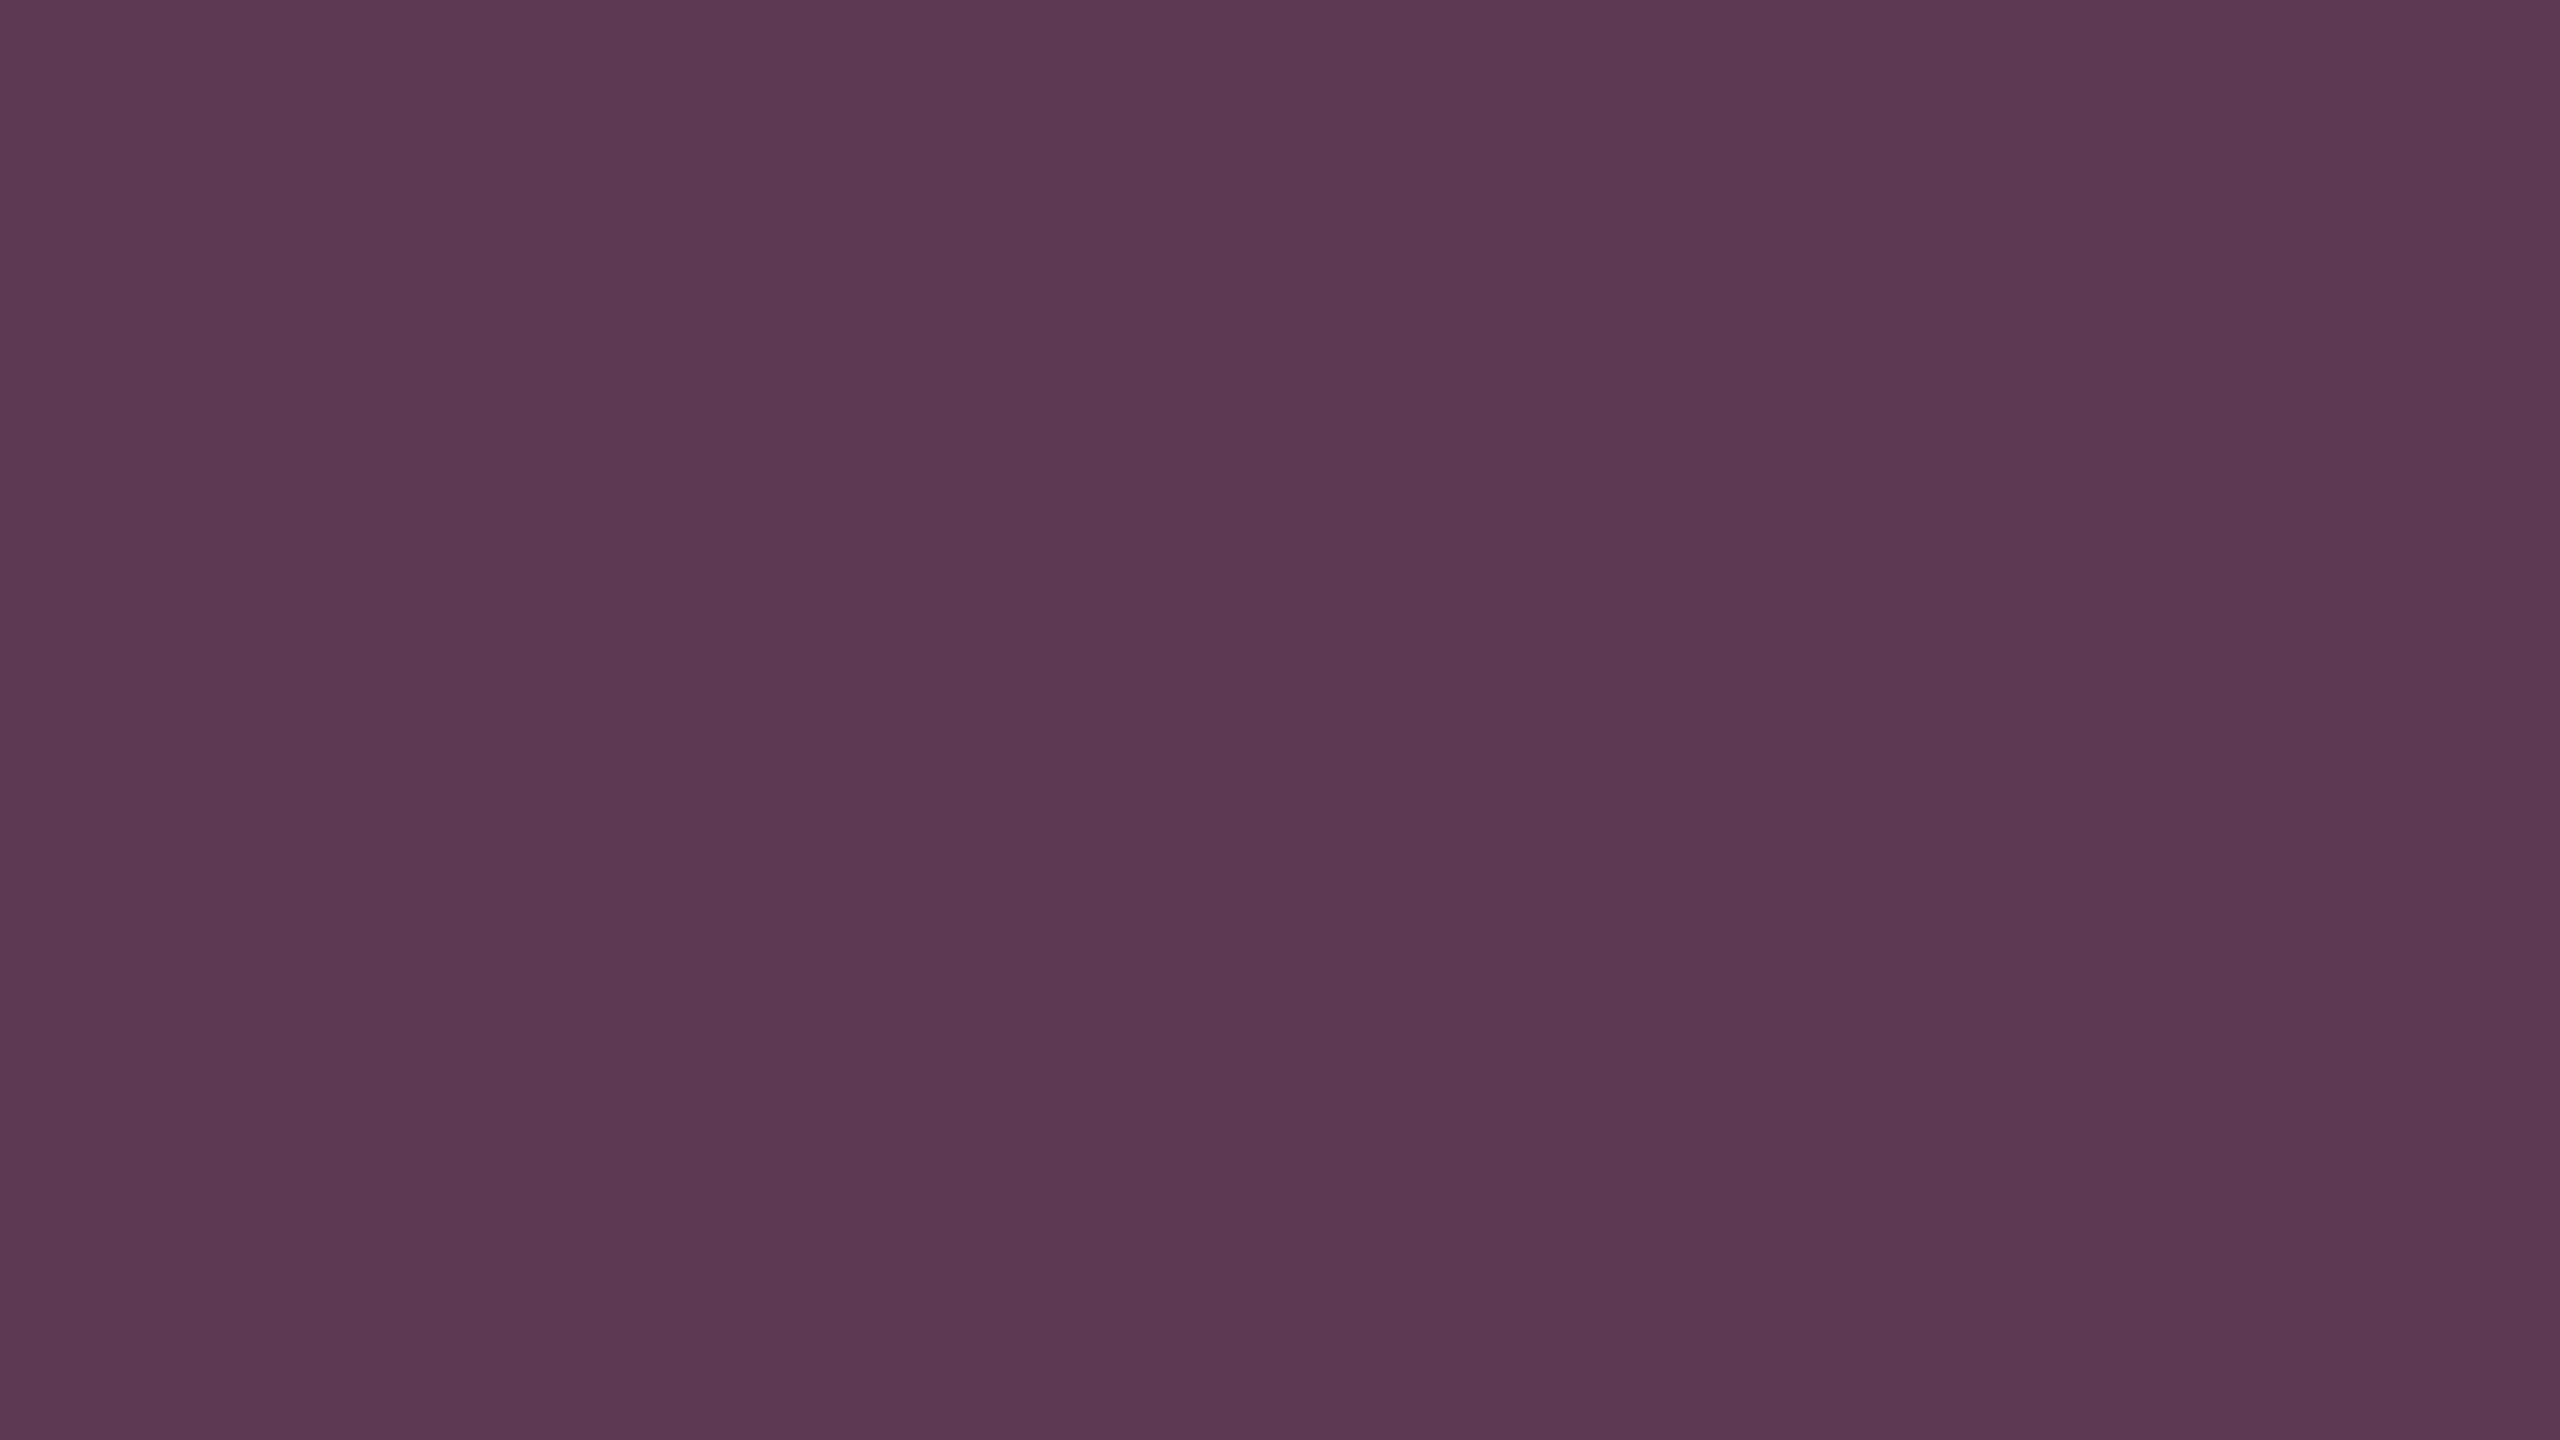 2560x1440 Dark Byzantium Solid Color Background